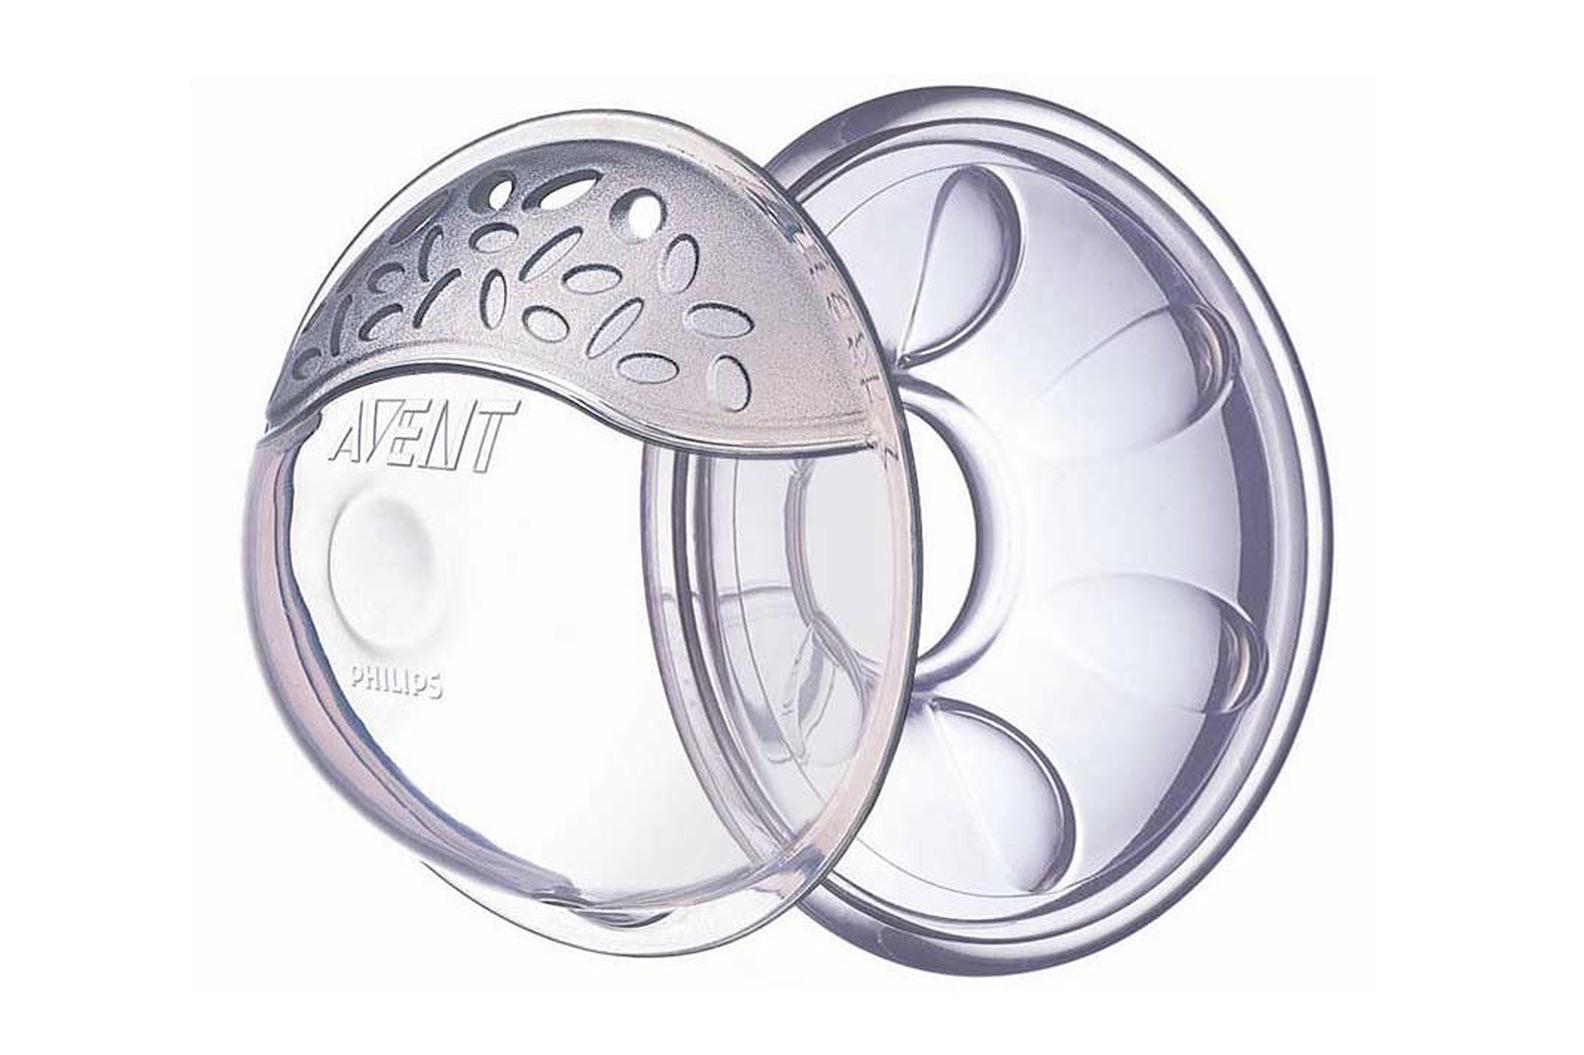 17-Web-TulettDesign_Avent_Breast-shell-1